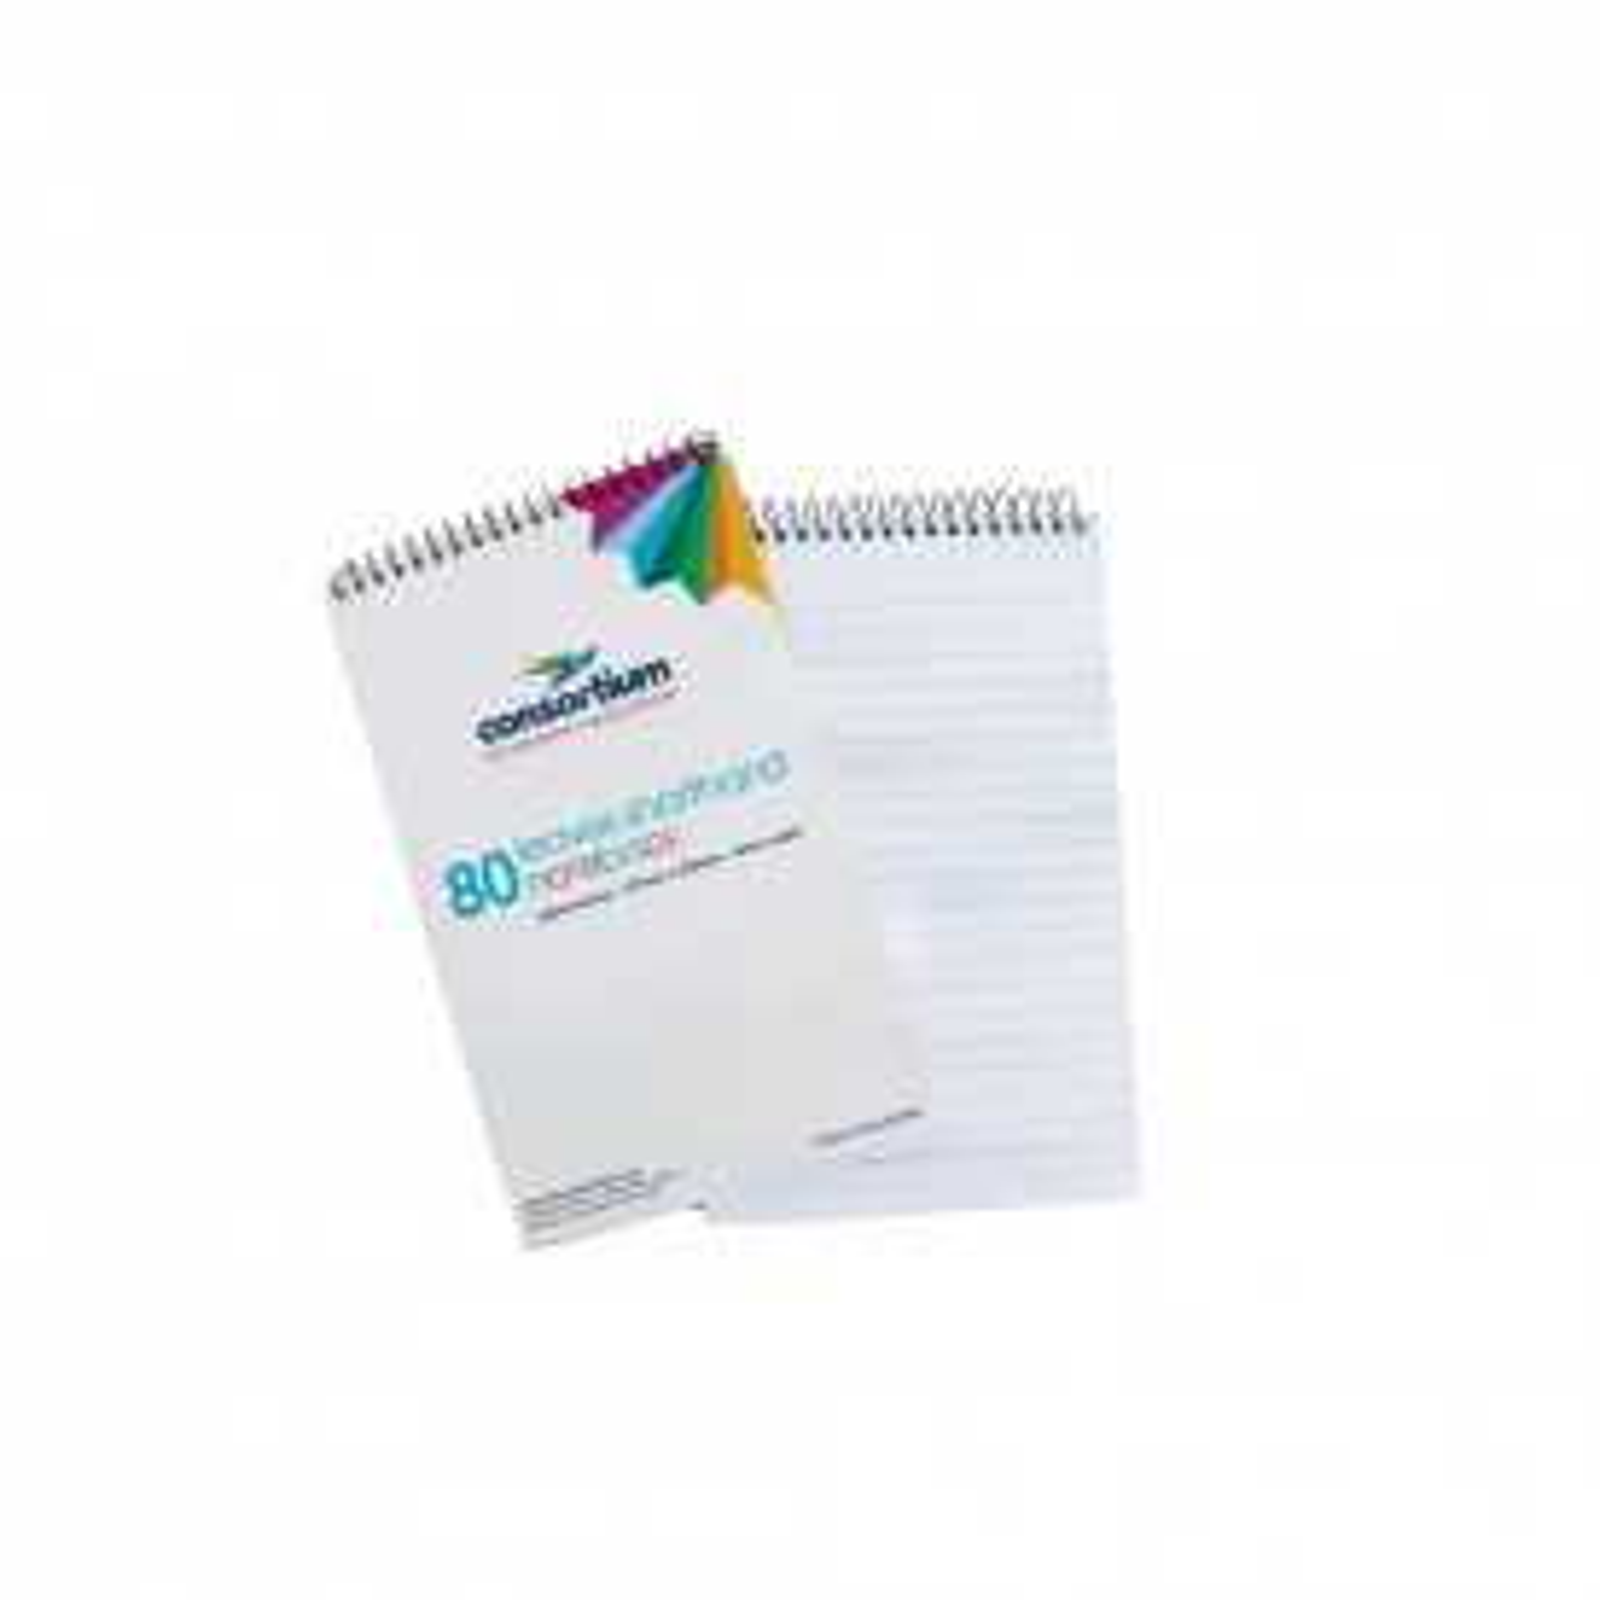 Consortium Shorthand Notebooks